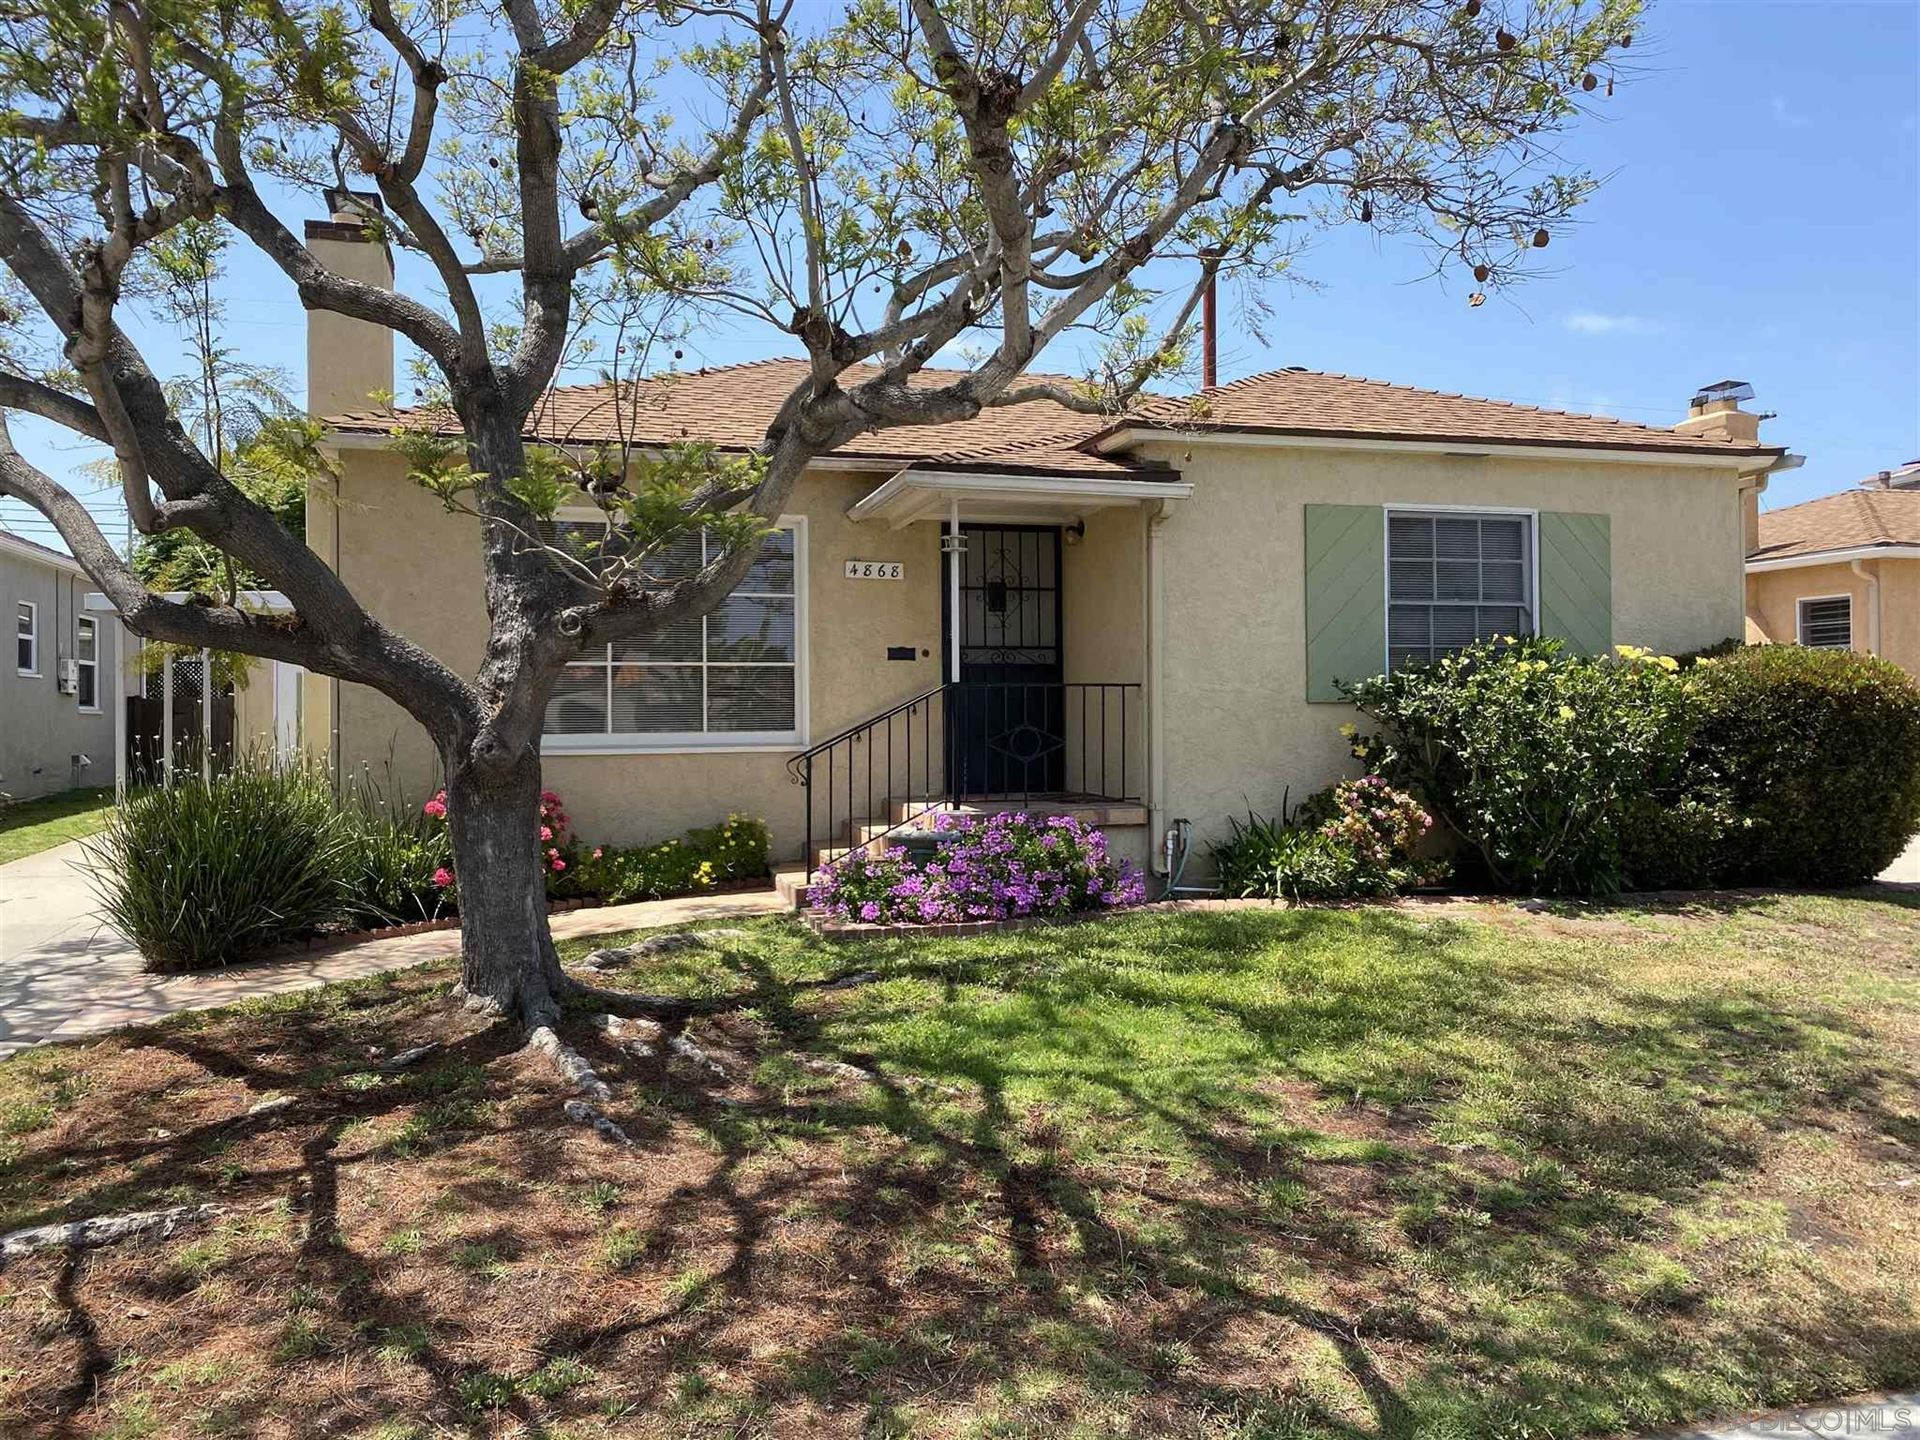 Photo for 4868 Vista Street, San Diego, CA 92116 (MLS # 210012345)